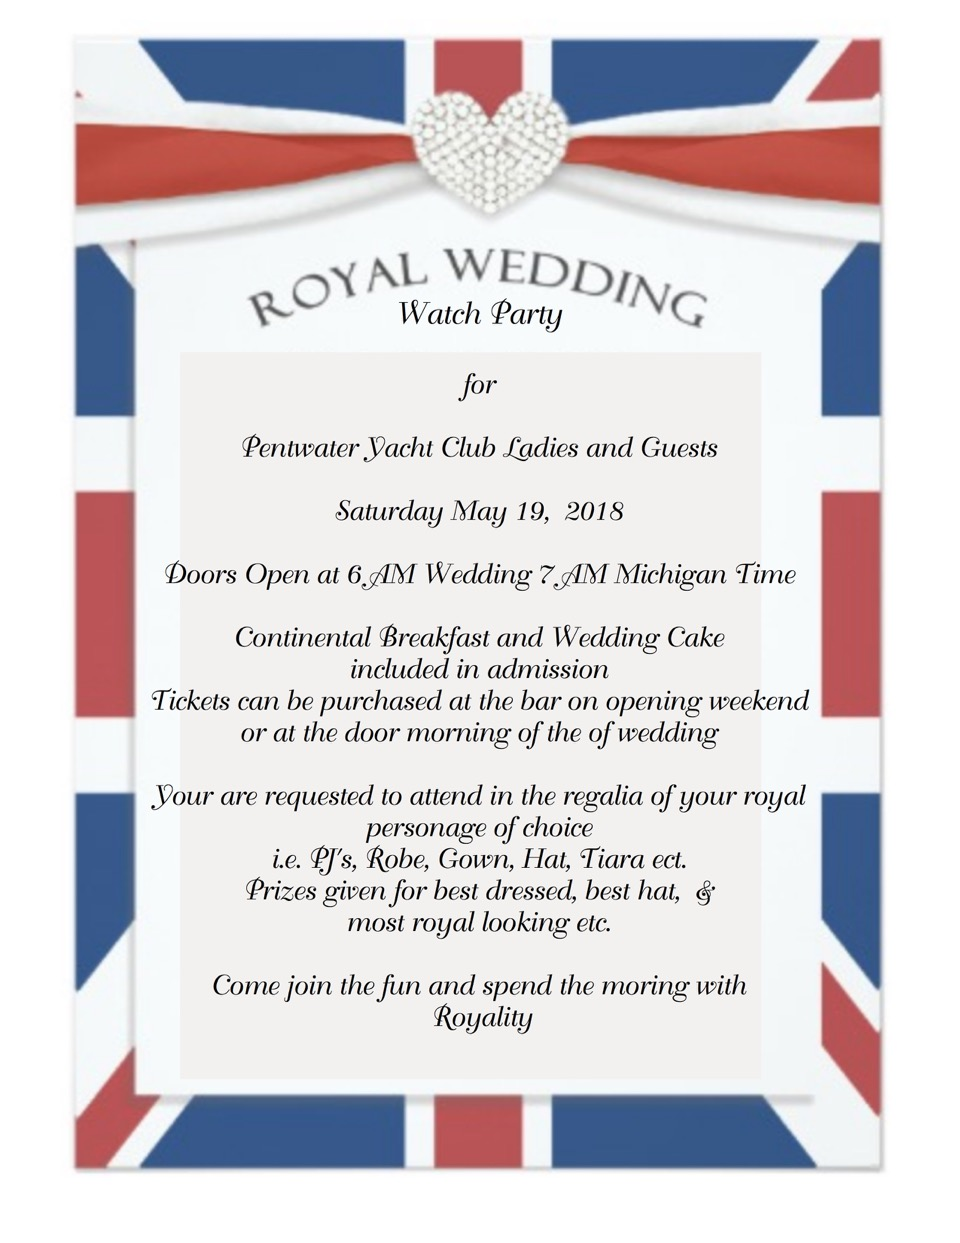 Roral Wedding-2-001.jpeg